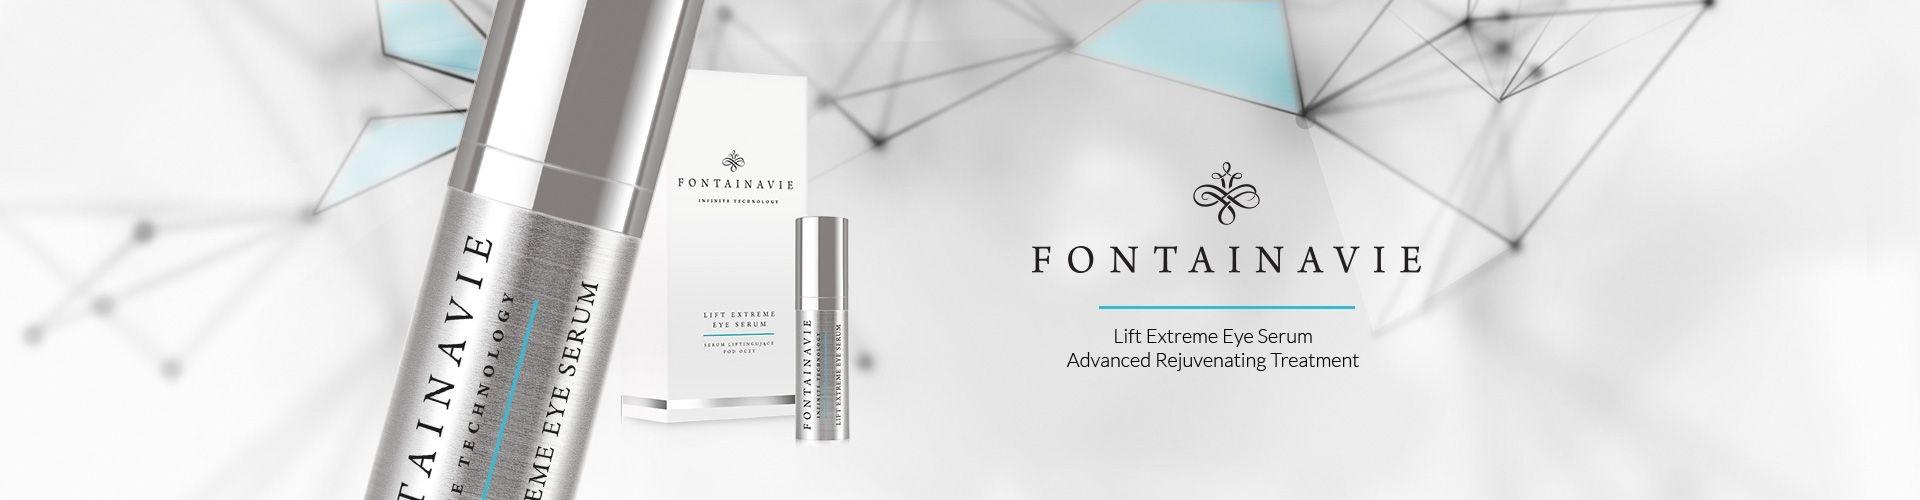 Automatic Lip Liner FM Cosmetics